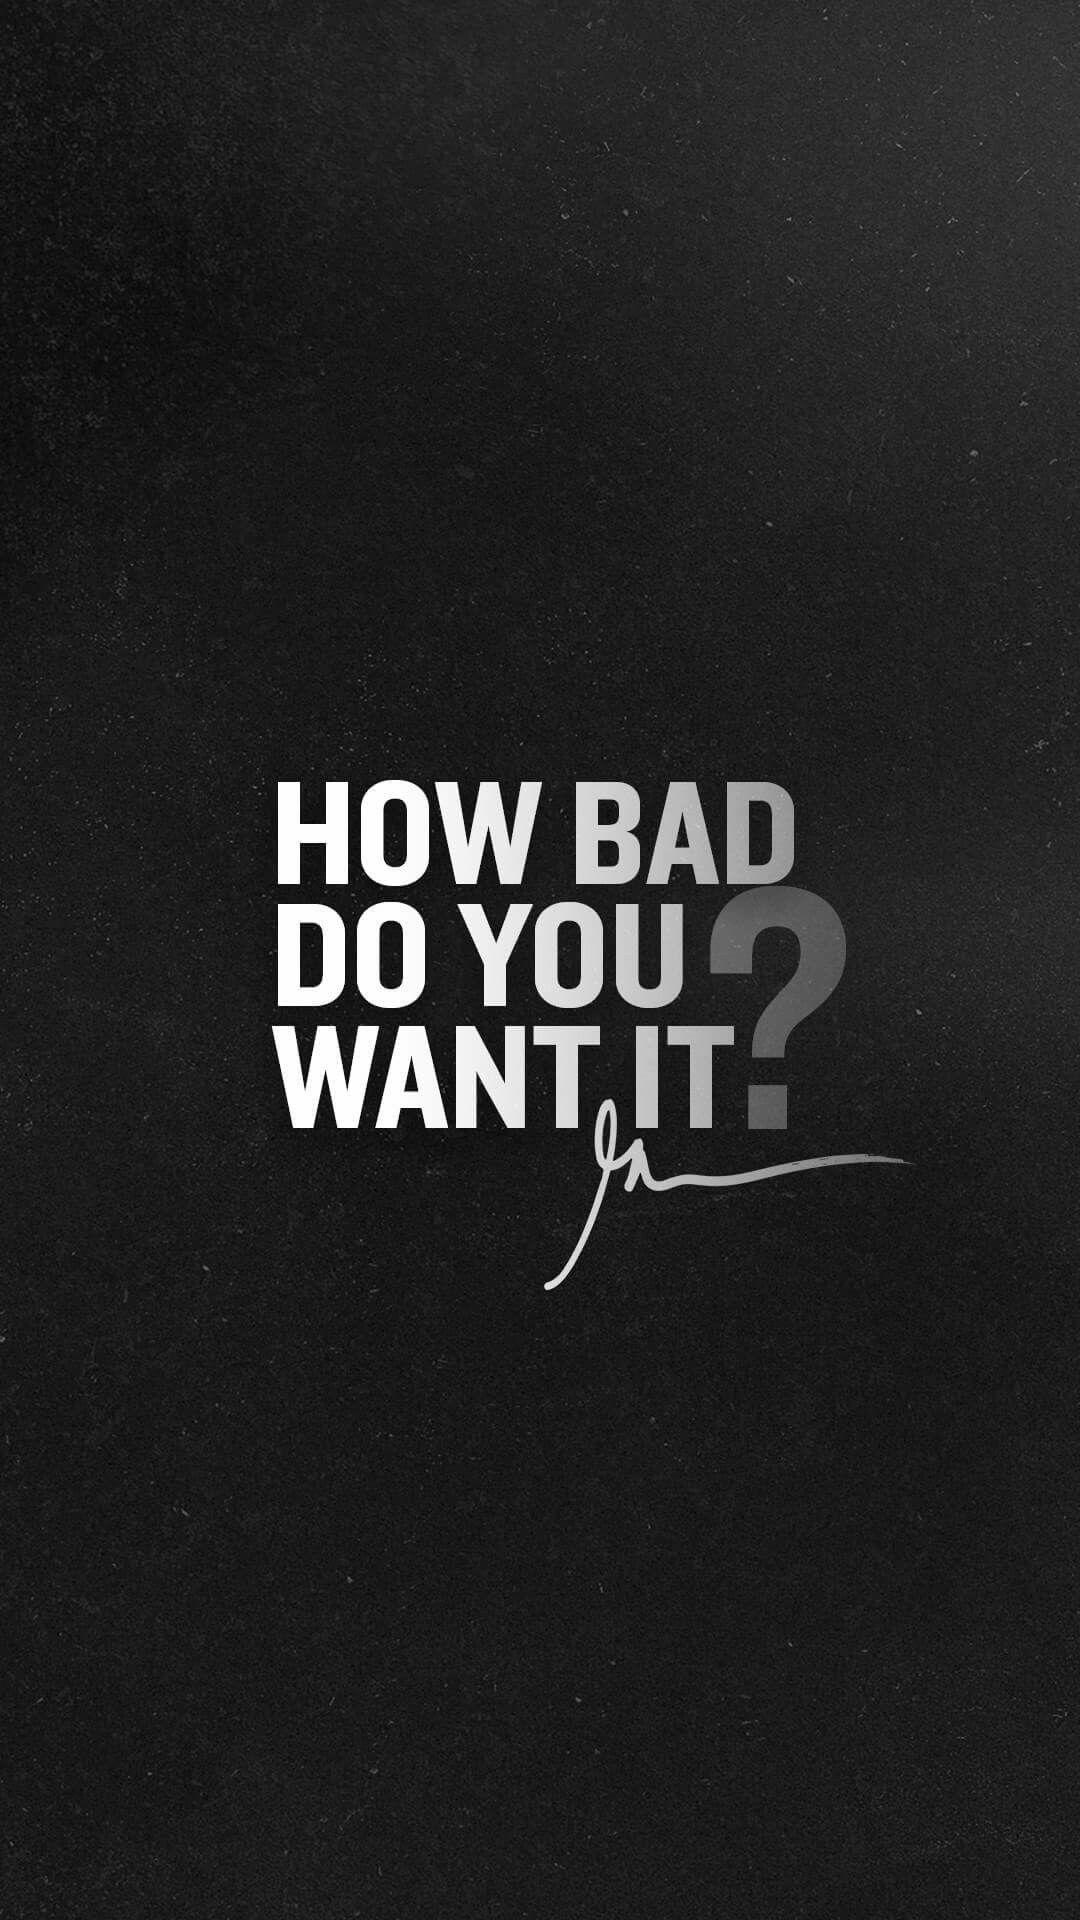 Motivation Motivational Quotes Wallpaper Good Life